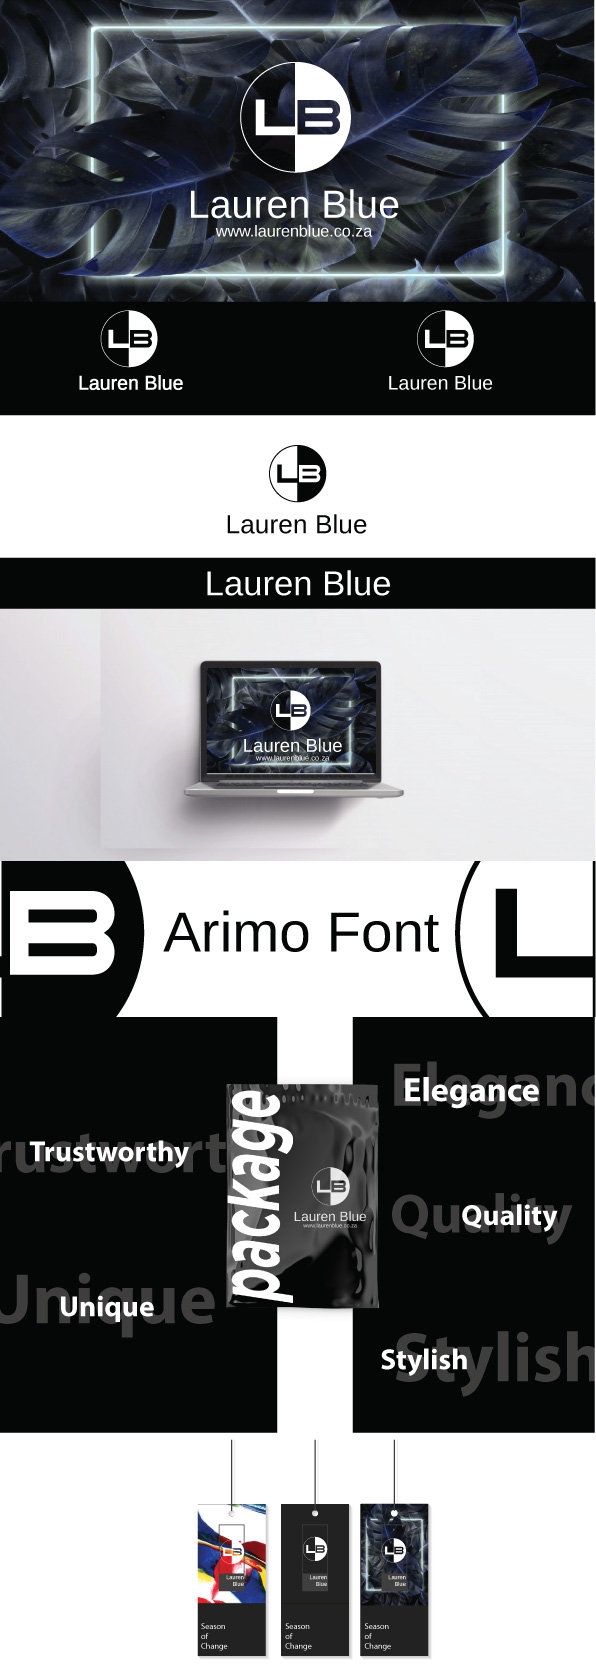 Lauren Blue CI presentation-01.jpg